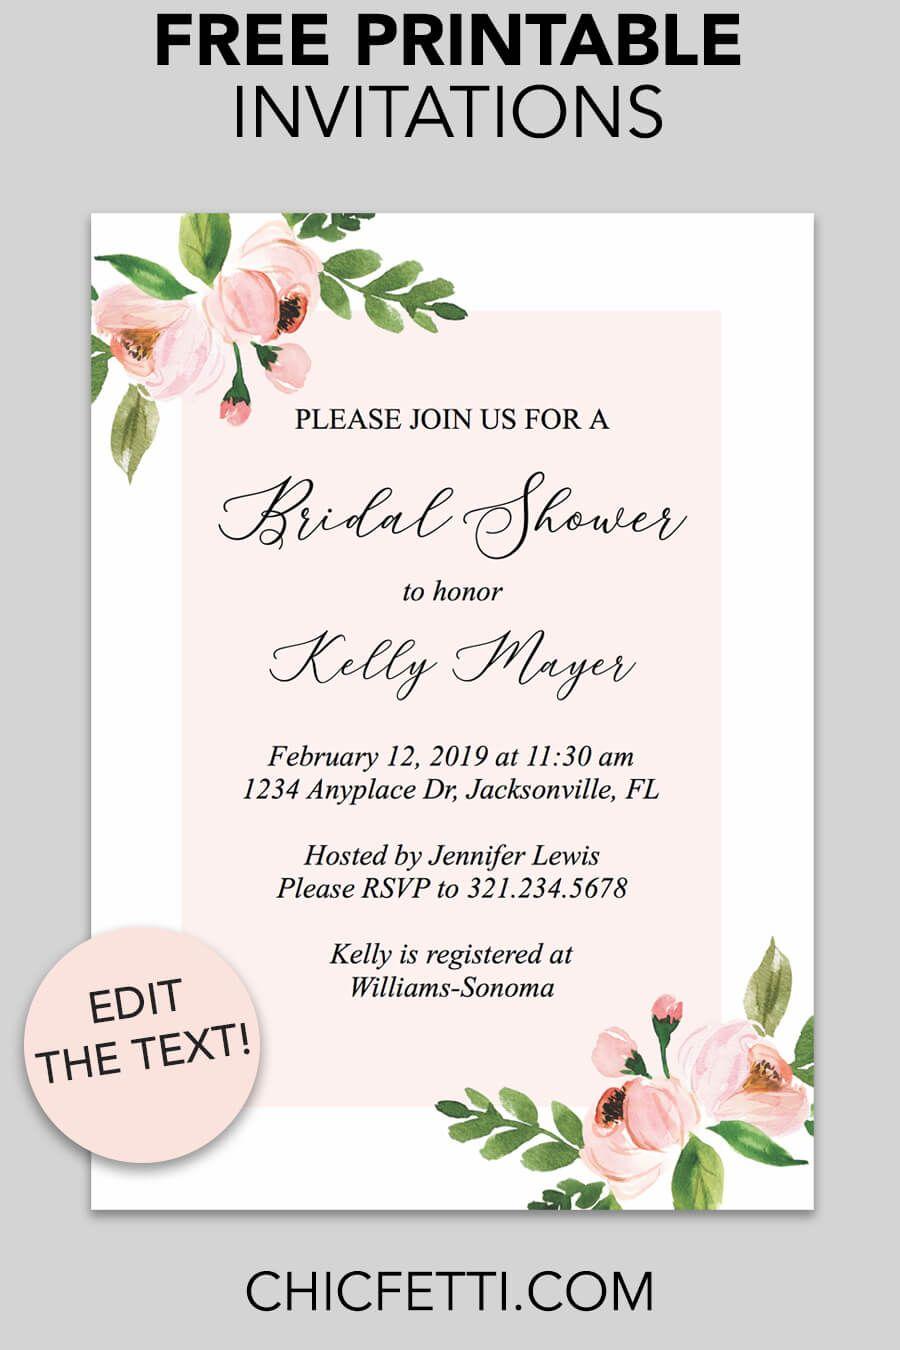 Bridal Shower Printable Invitation (Light Pink Floral | Free - Free Printable Bridal Shower Invitations